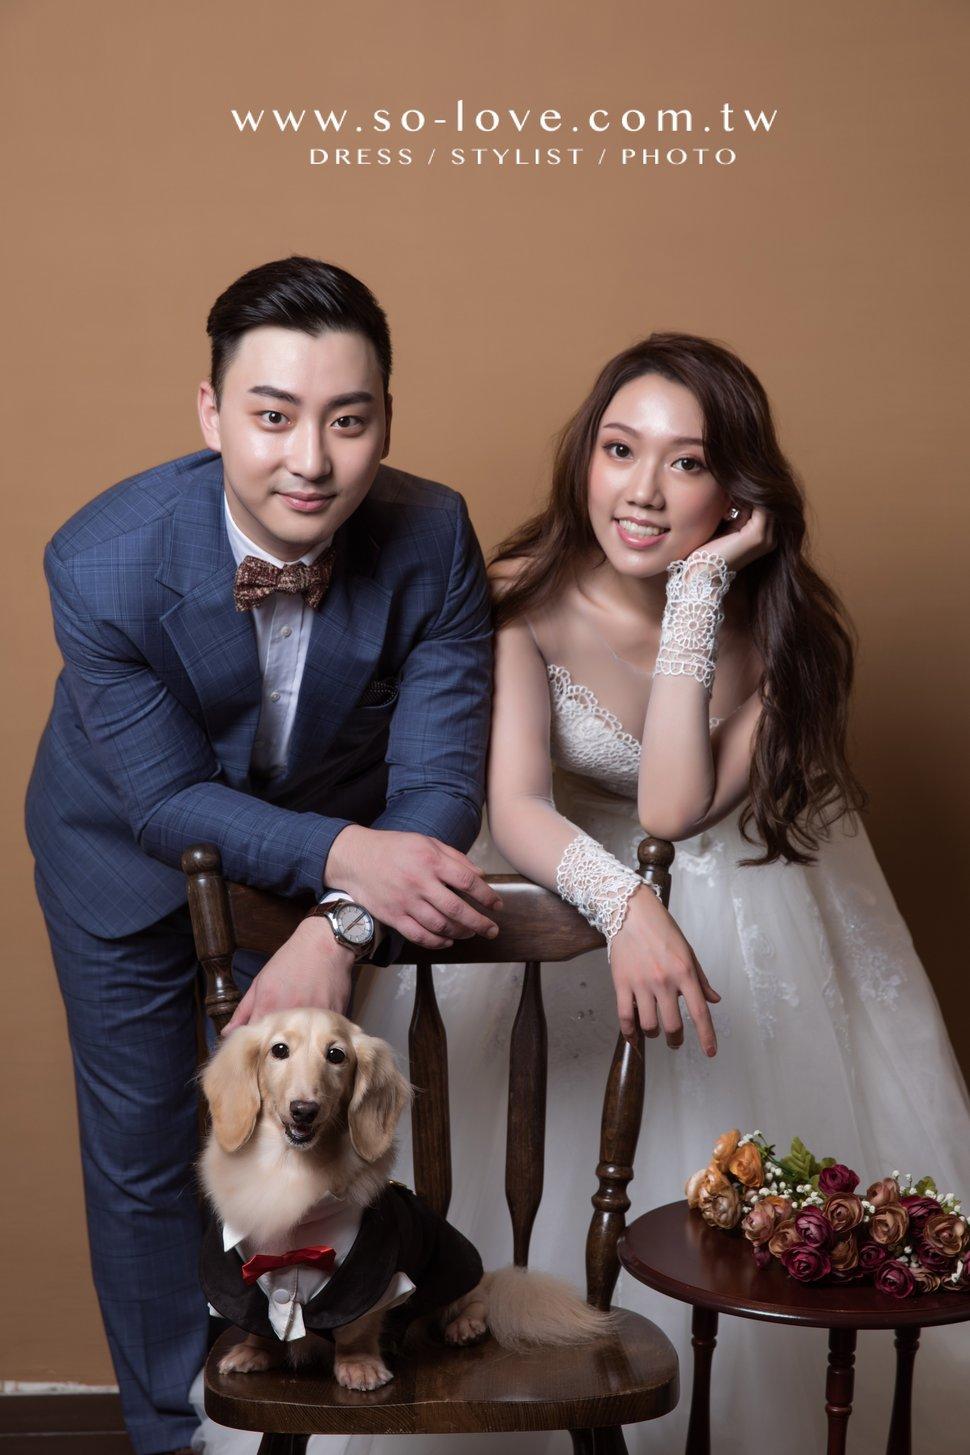 Y RYAN4011 - So.Love Wedding 樂樂蕾絲《結婚吧》